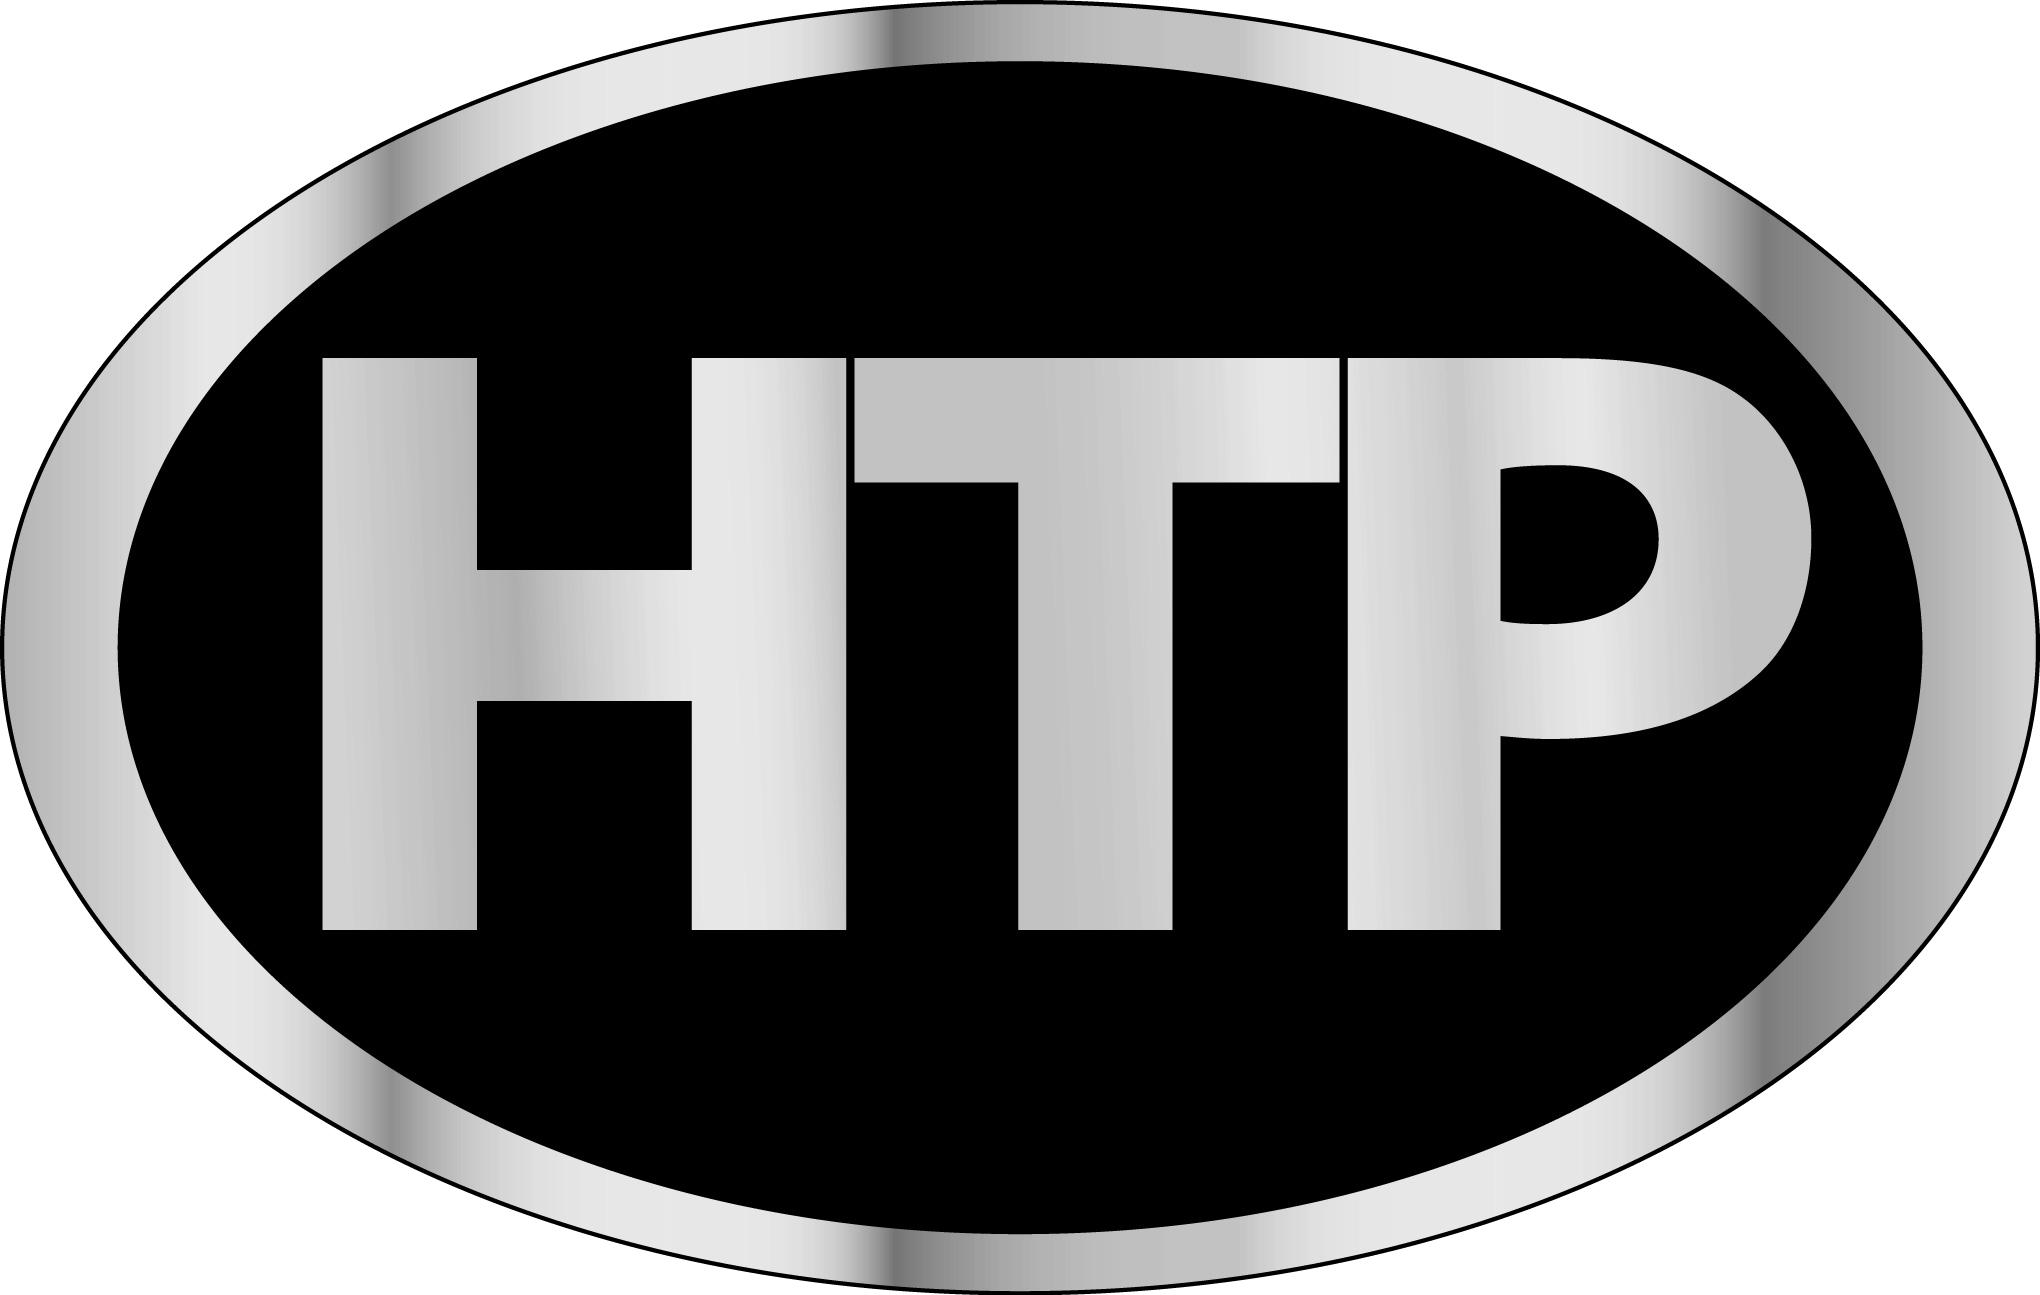 Htp S Condensing Units